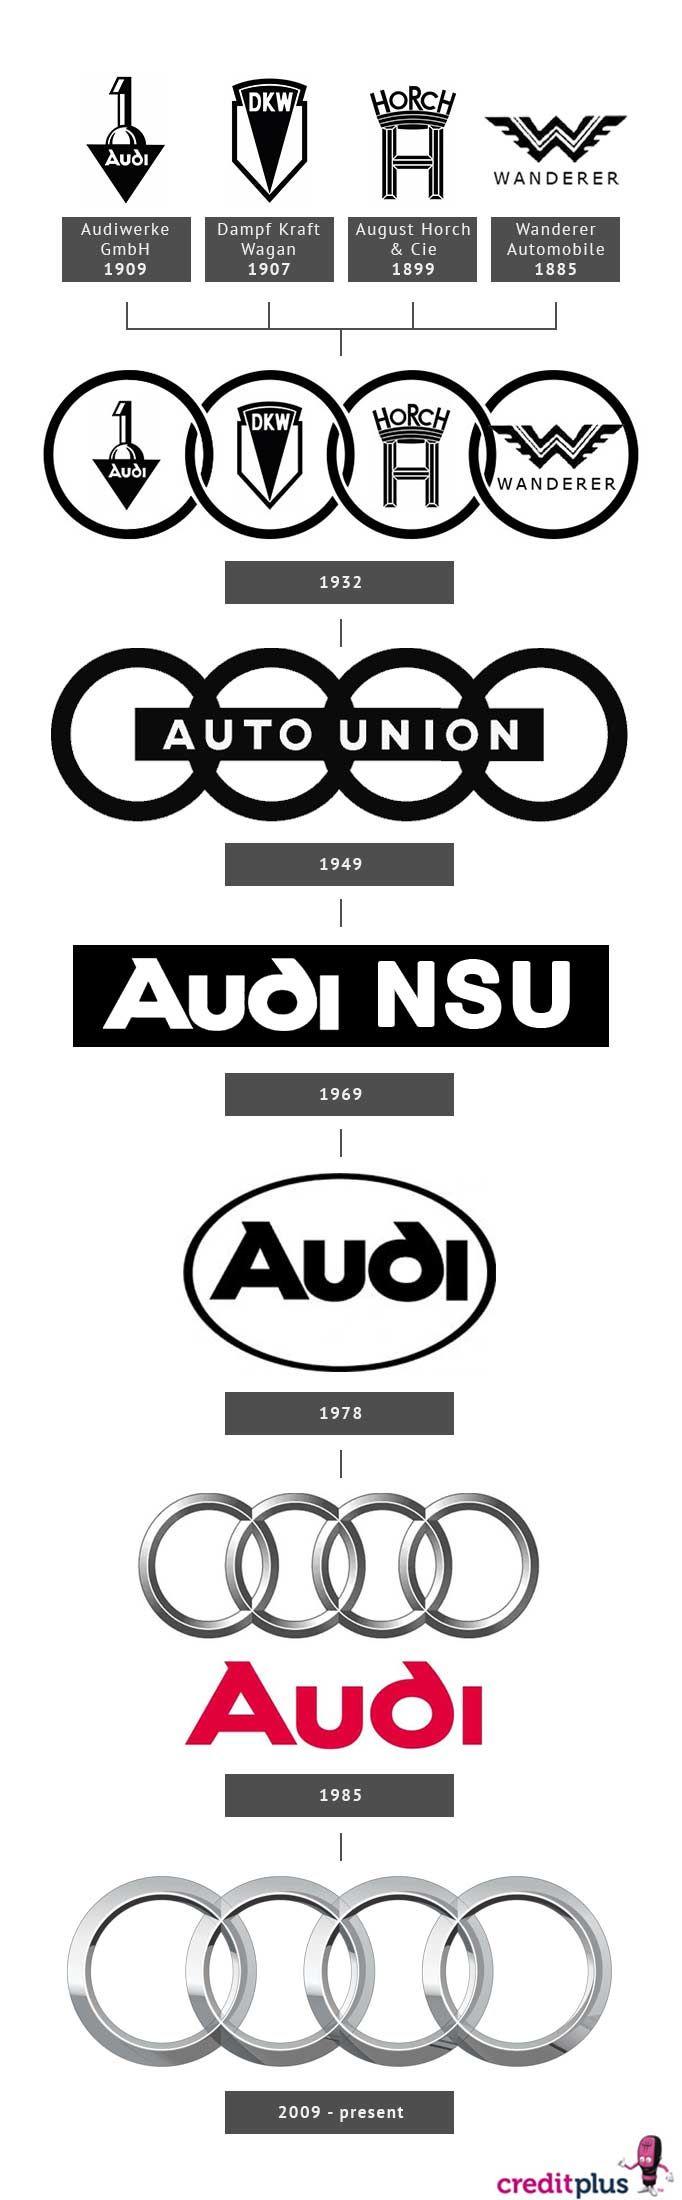 audi-logo-infographic-finalised